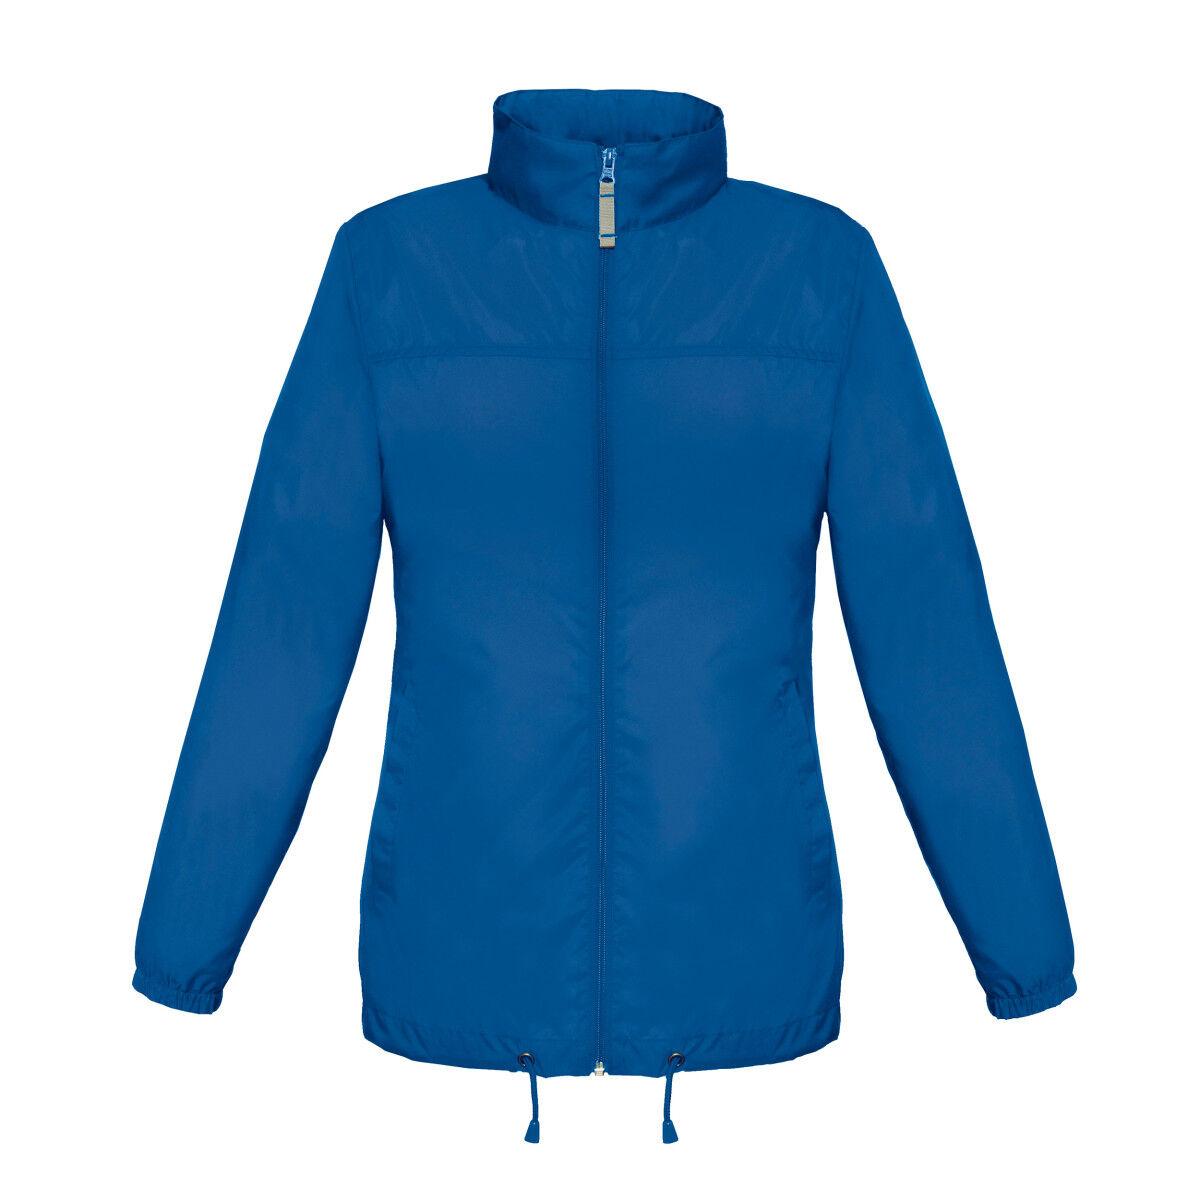 B&C Sirocco Lightweight Jacket (Blue)